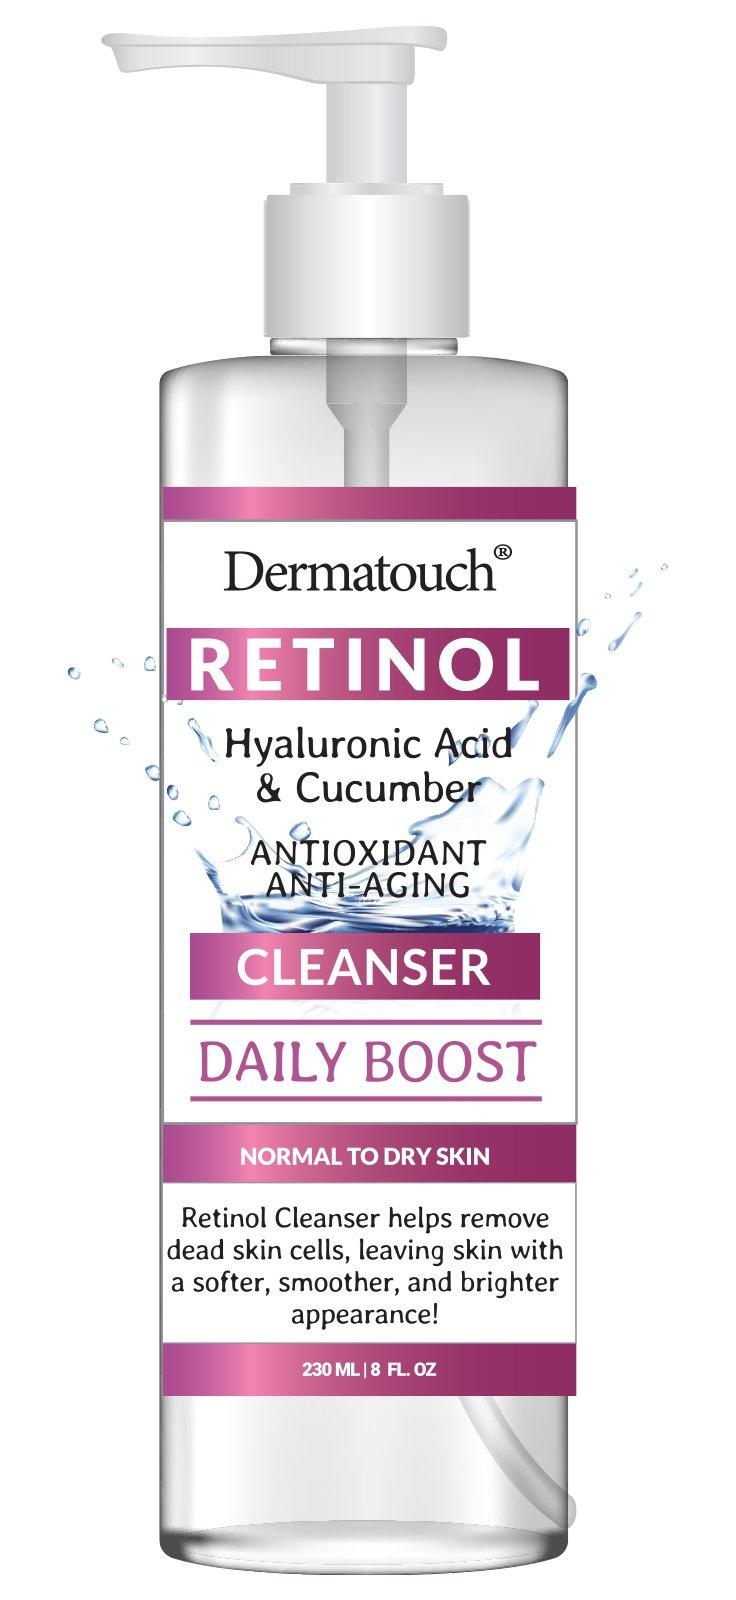 homespacollection Dermatouch Retinol Hyaluronic Acid Cucumber Cleanser